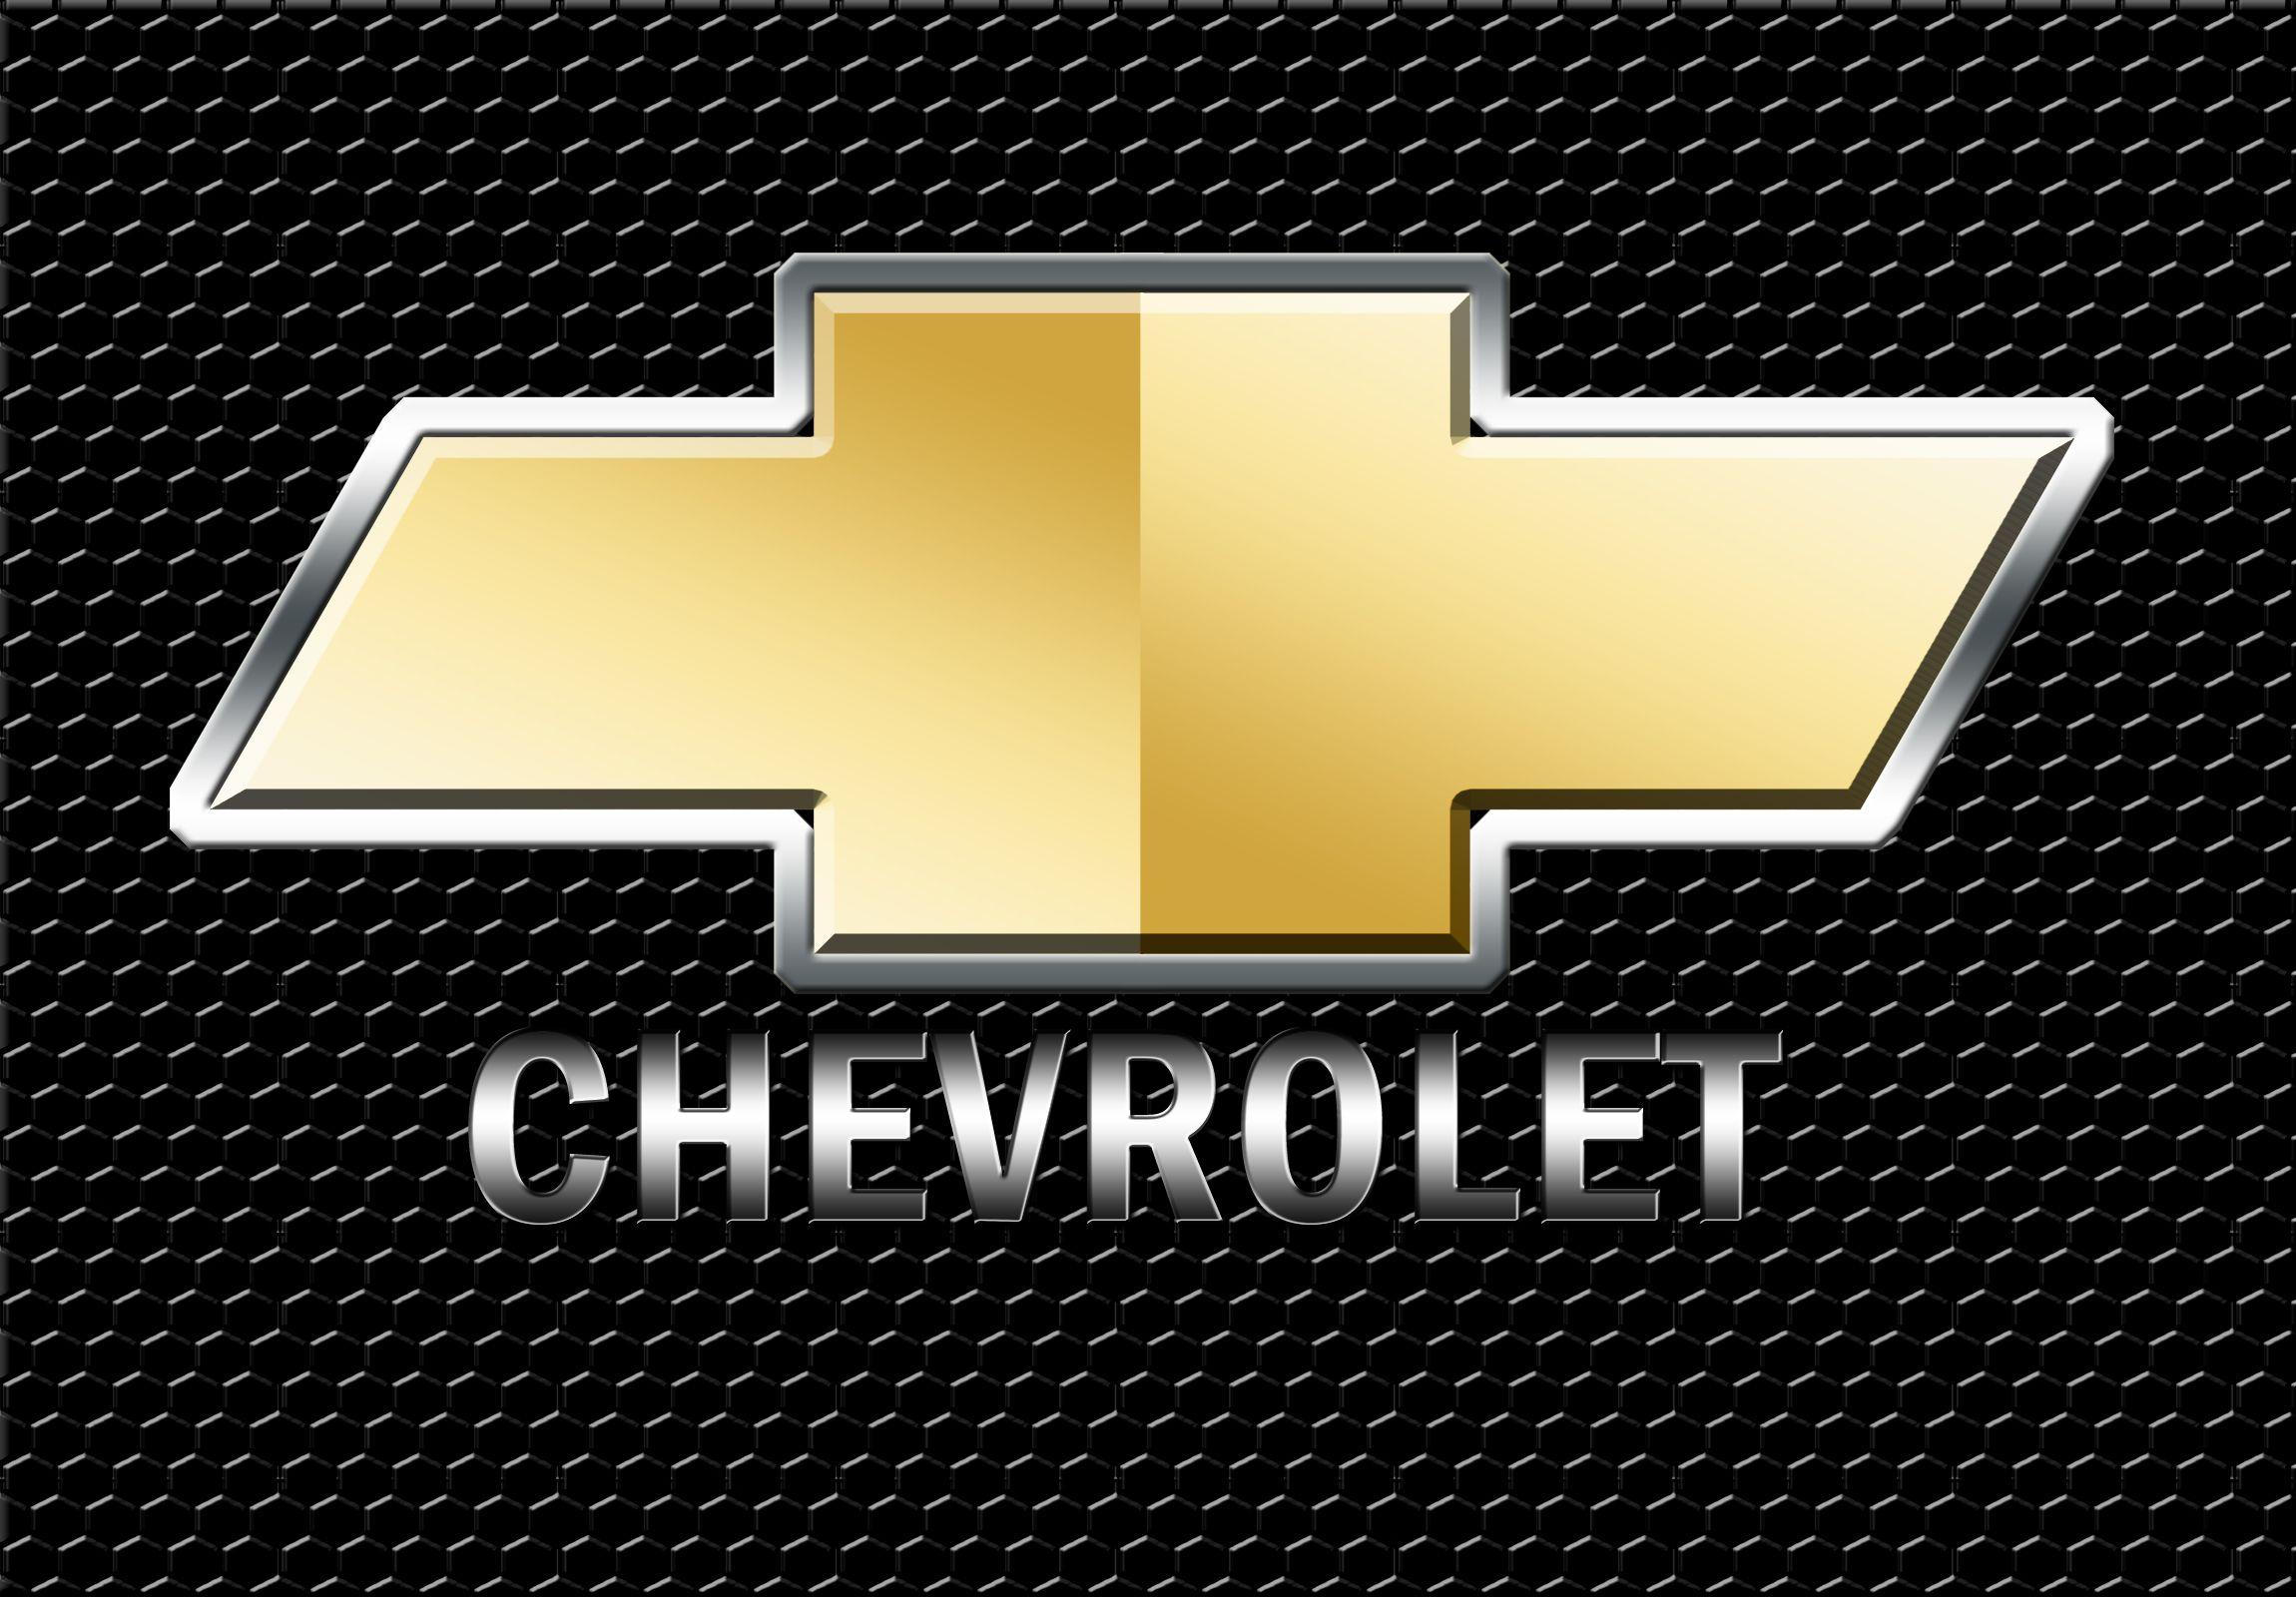 Chevy Chevrolet Wallpaper Car Brands Logos Logo Wallpaper Hd